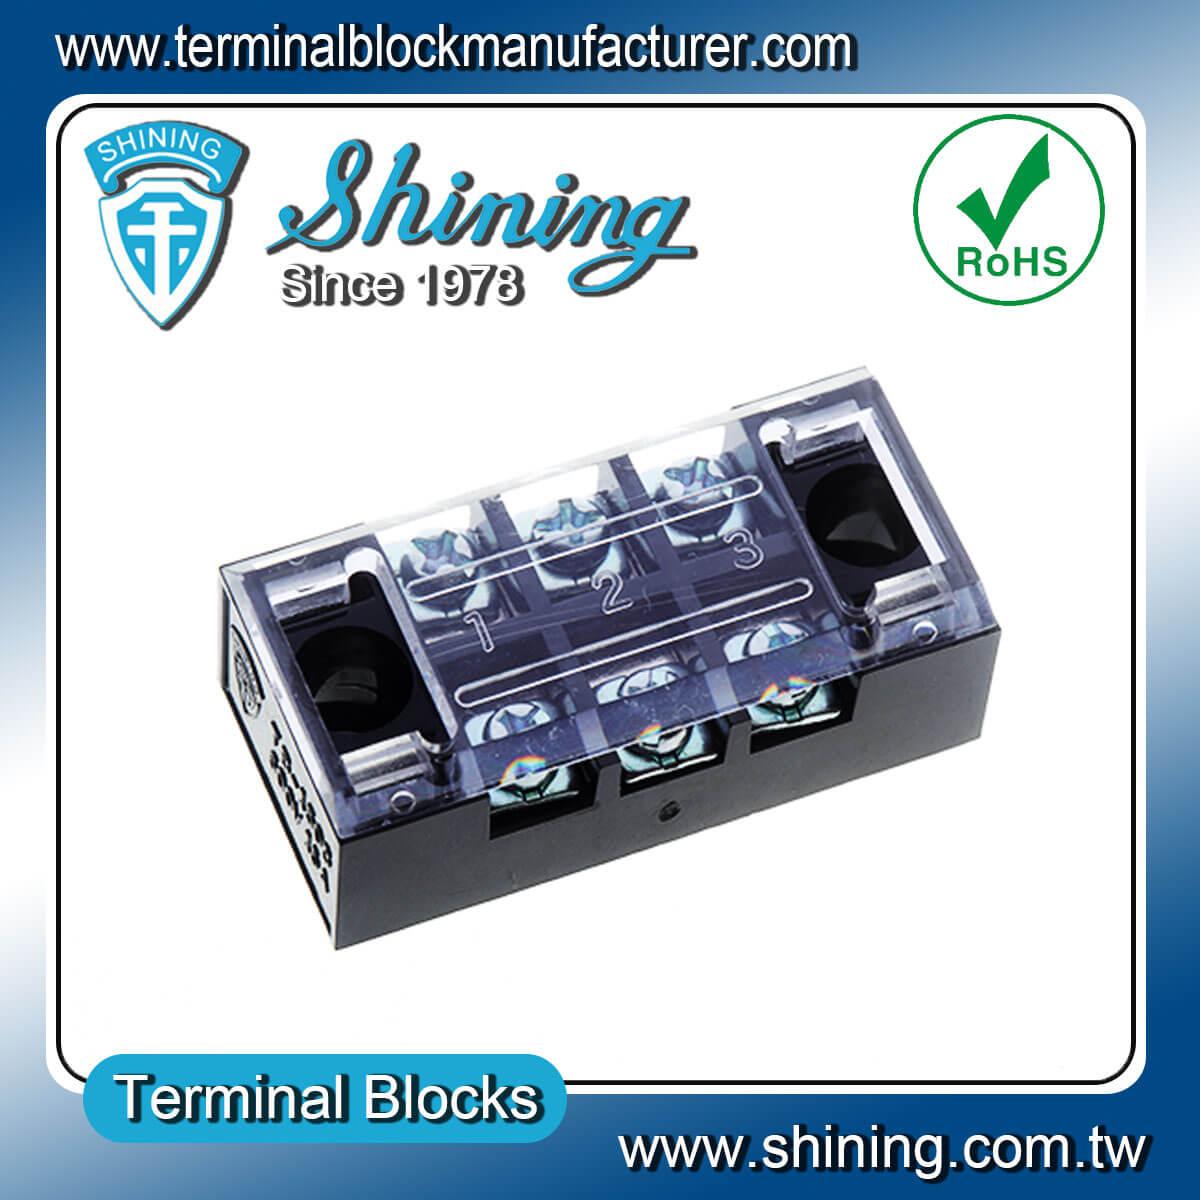 TB-2503 600V 15A 3Pole固定式柵欄端子台